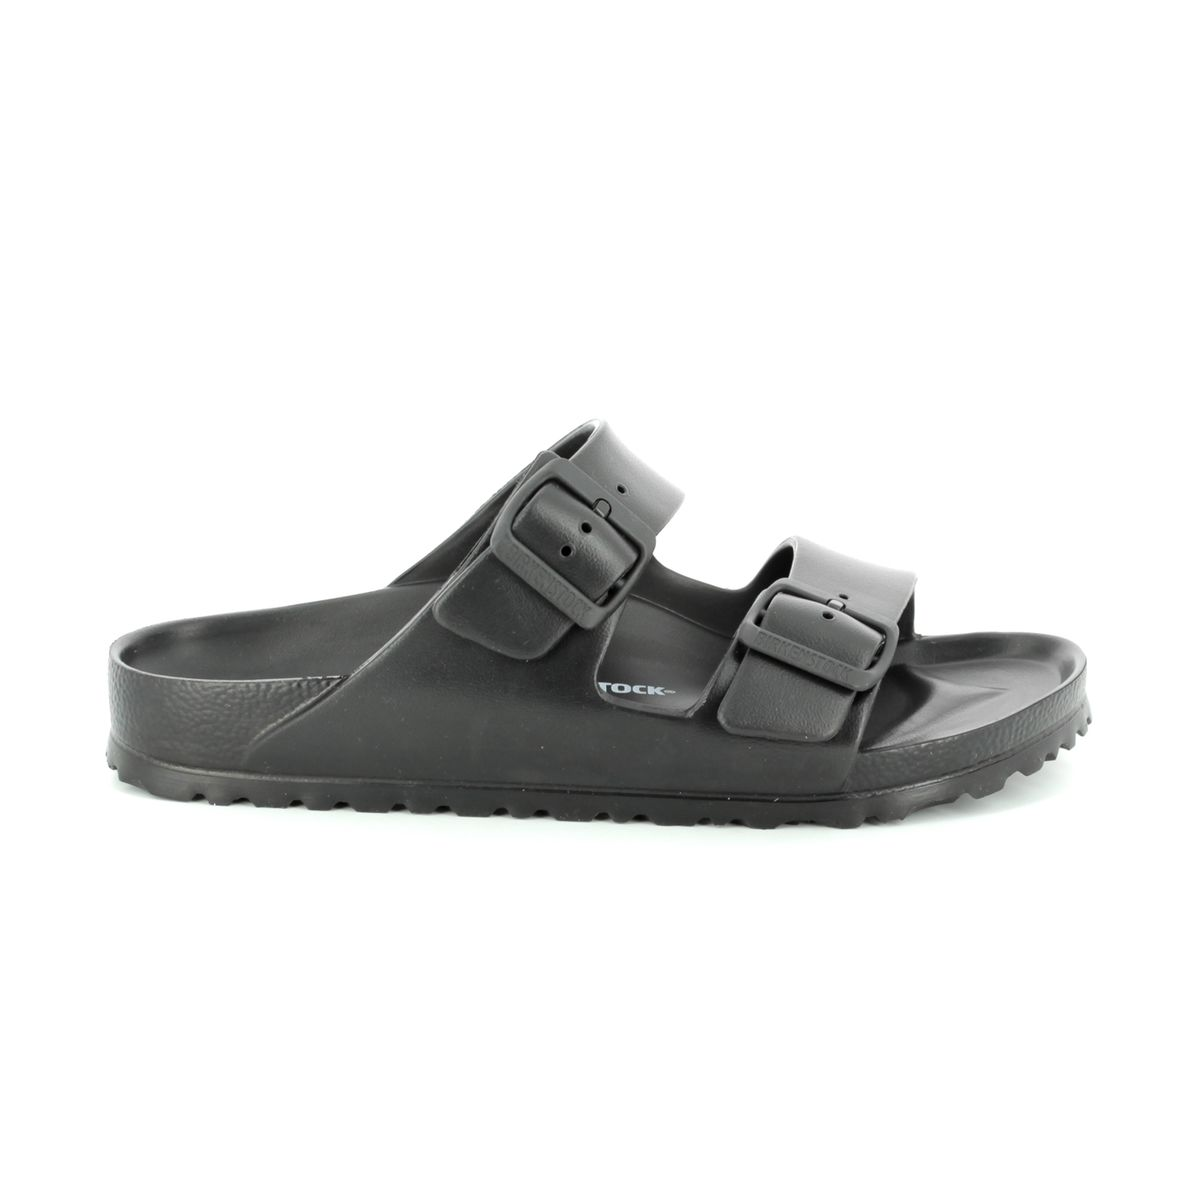 42f384c72ed Birkenstock Sandals - Black - 129/423 ARIZONA EVA Narrow Fit